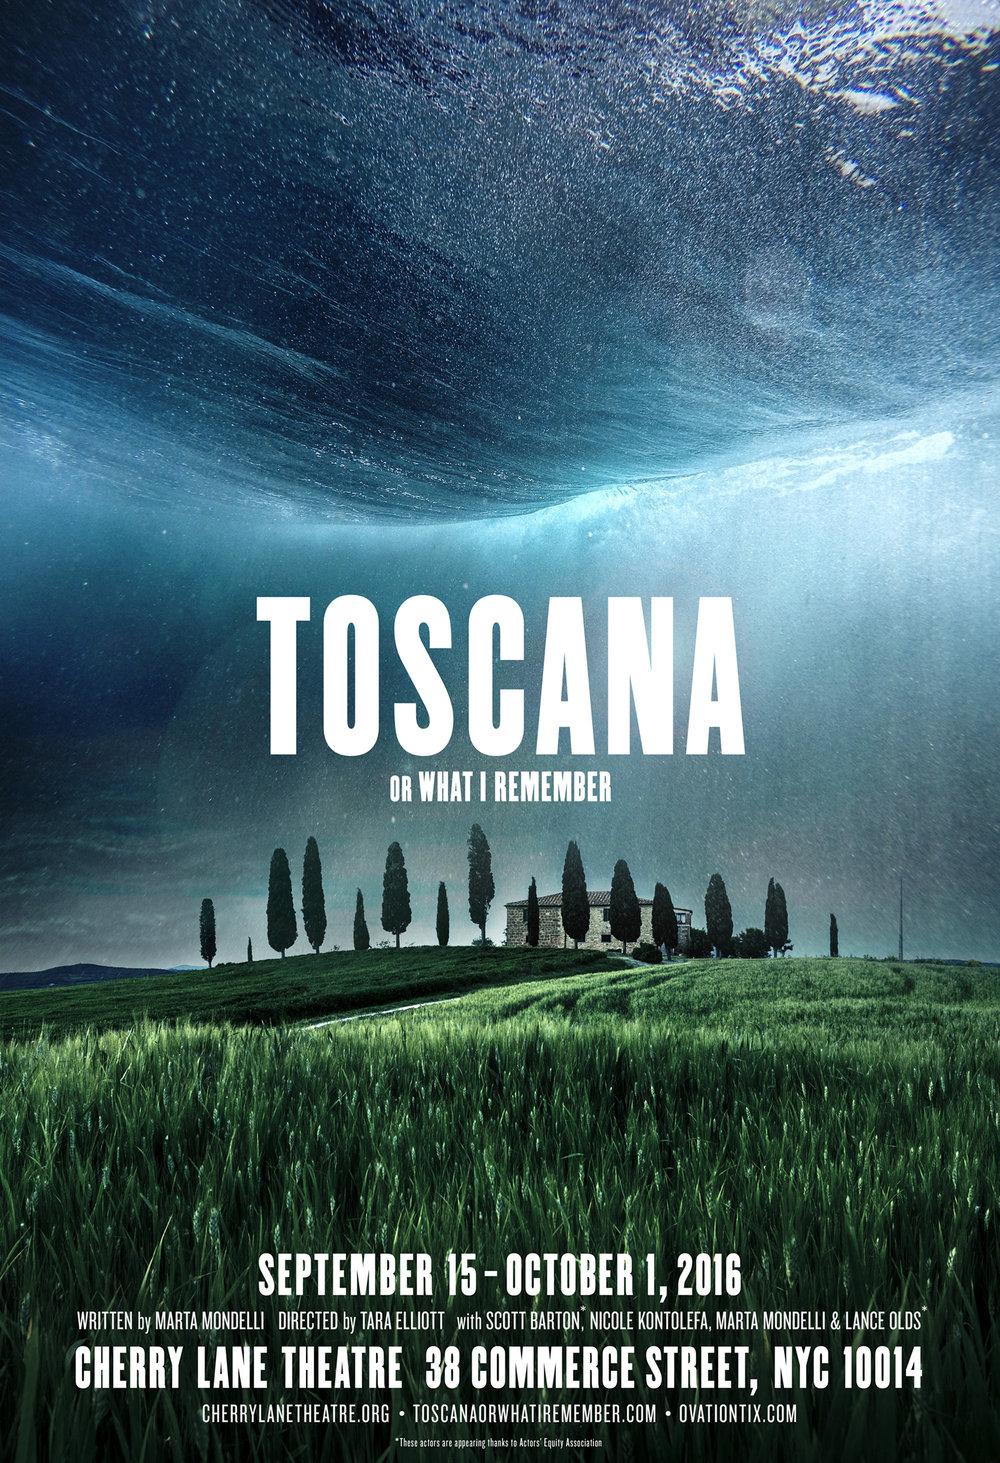 TOSCANA FINAL LOWRES-2.jpg